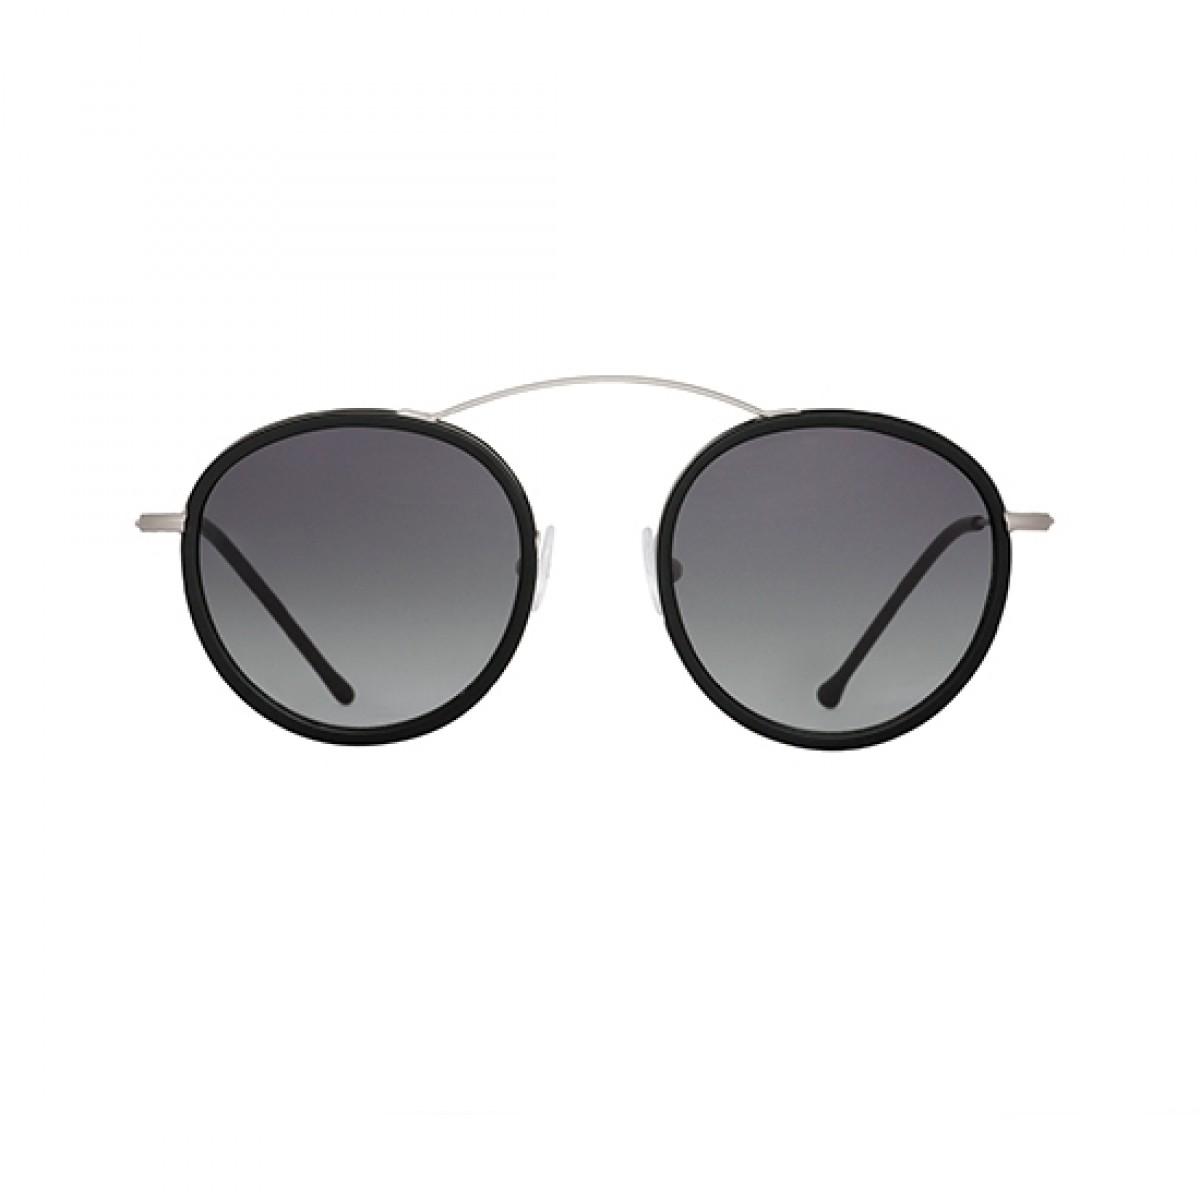 Metro 2 Flat Argento/Nero sfumato Grigio, 173,99€, Occhiali Spektre Argento a forma Ovale